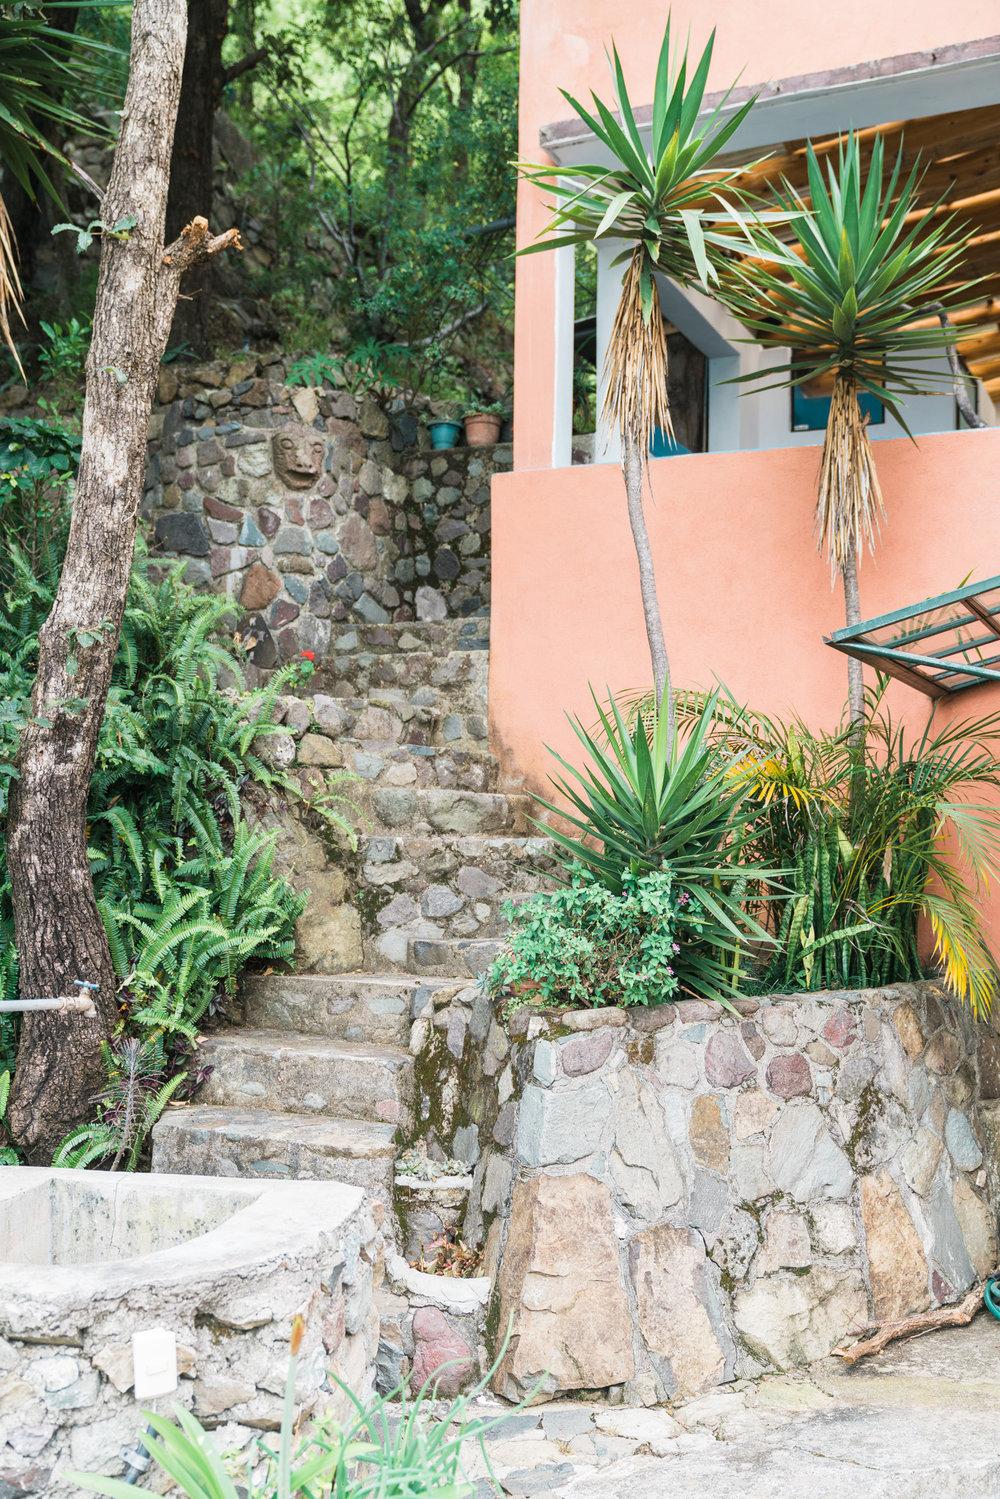 Stairs up to the bathroom at Adobe Airbnb in Jaibalito at lake atitlan